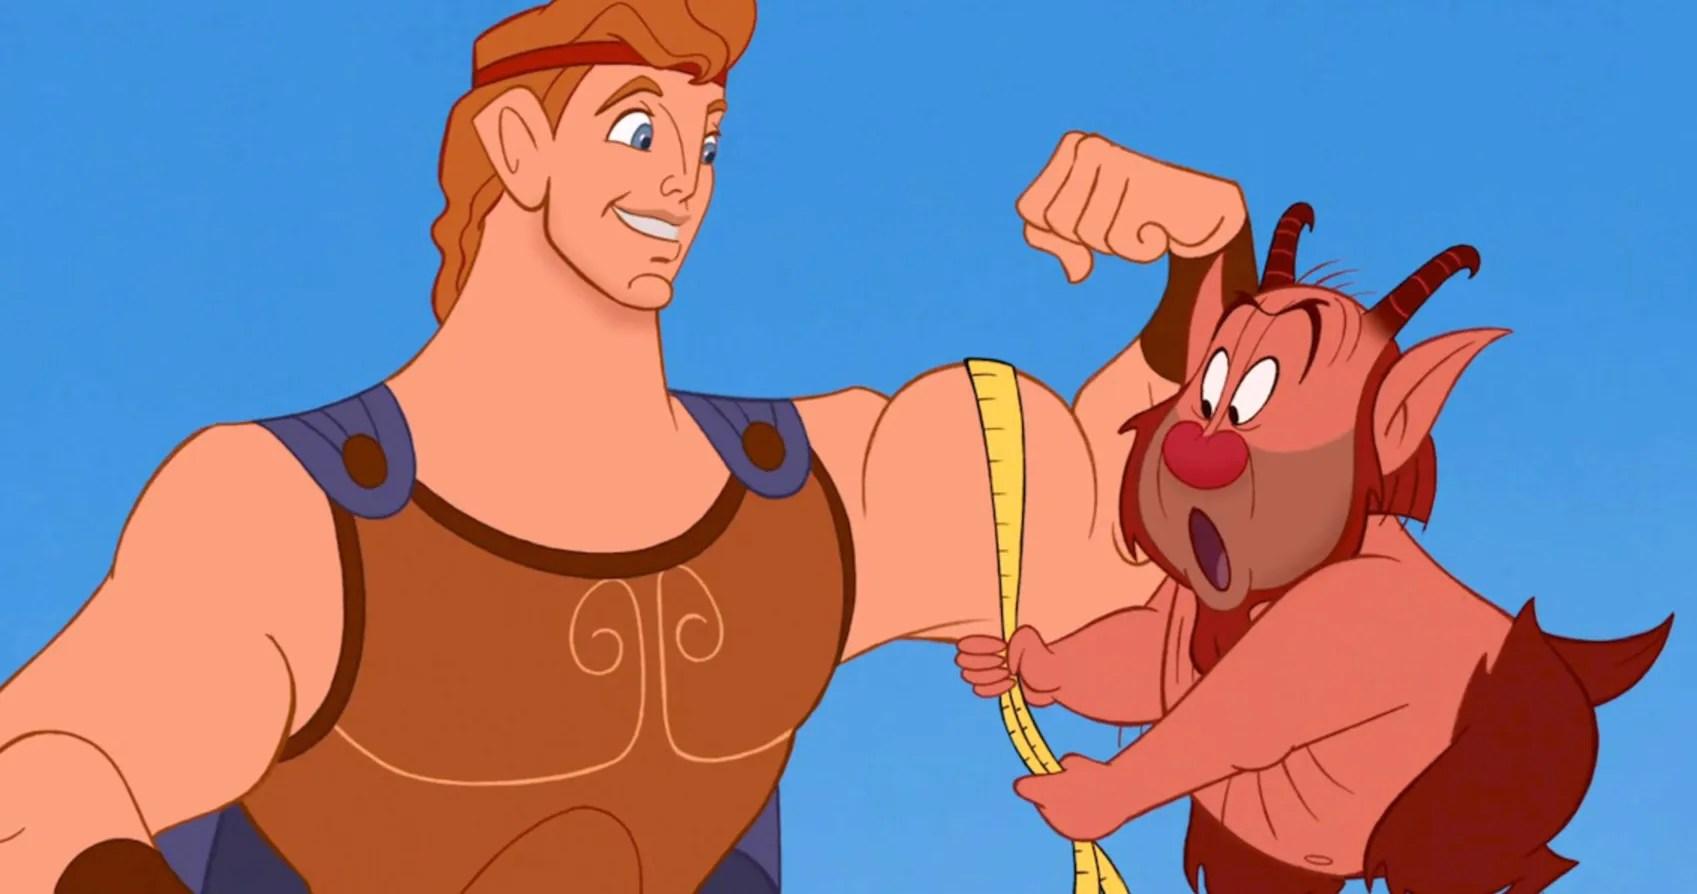 Disney's 'Hercules' Remake Is Happening, 'Avengers: Endgame' Directors Will Produce